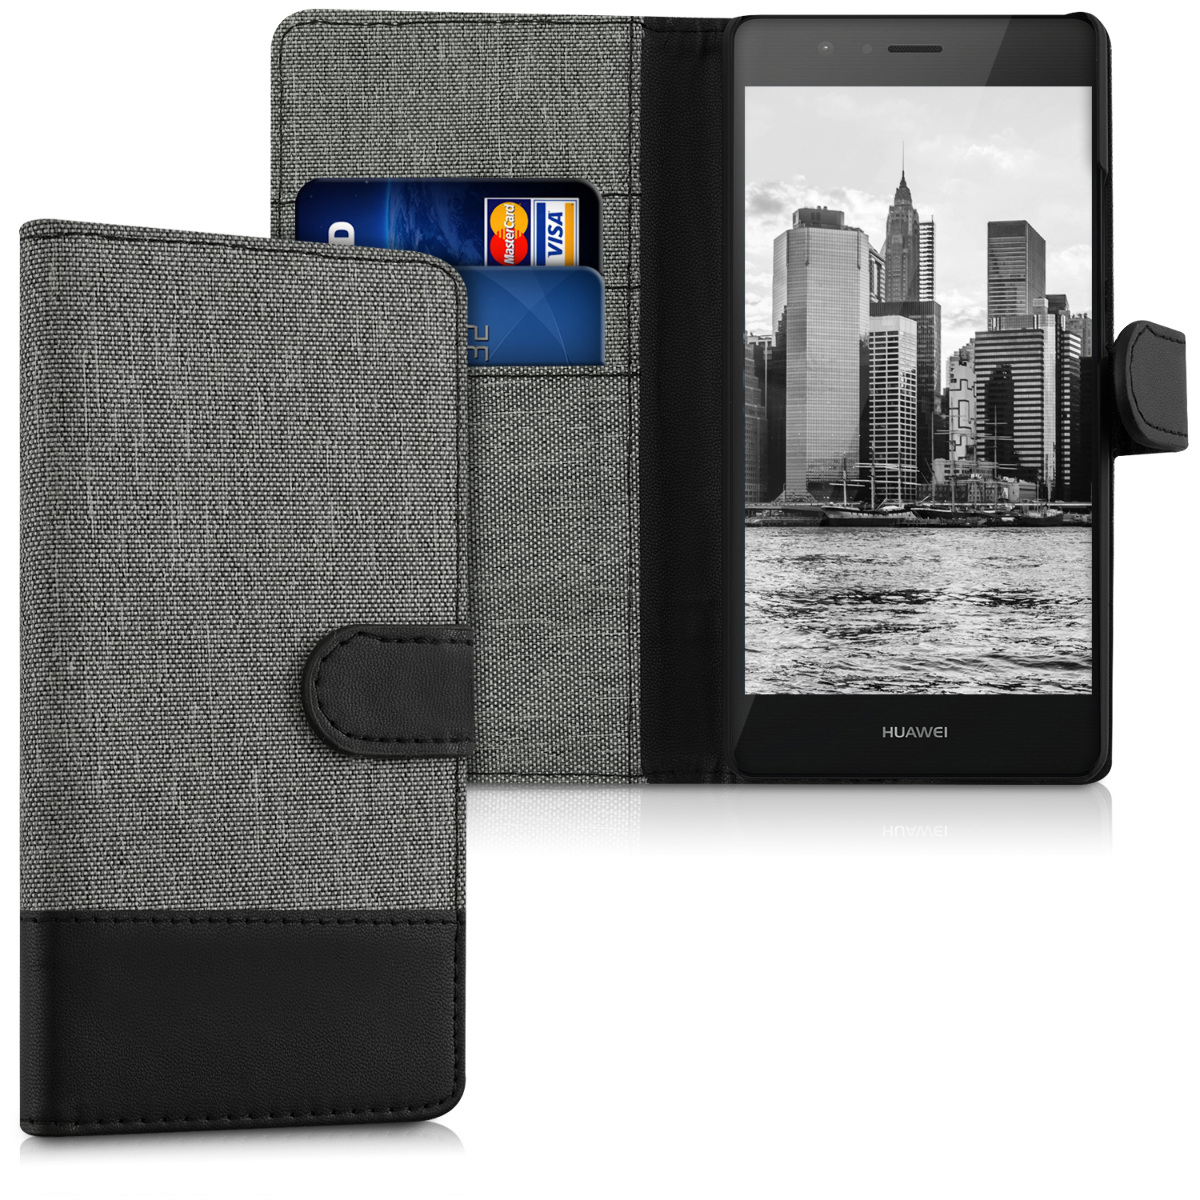 KW Θήκη - Πορτοφόλι Huawei P9 Lite - Grey / Black (38037.22)